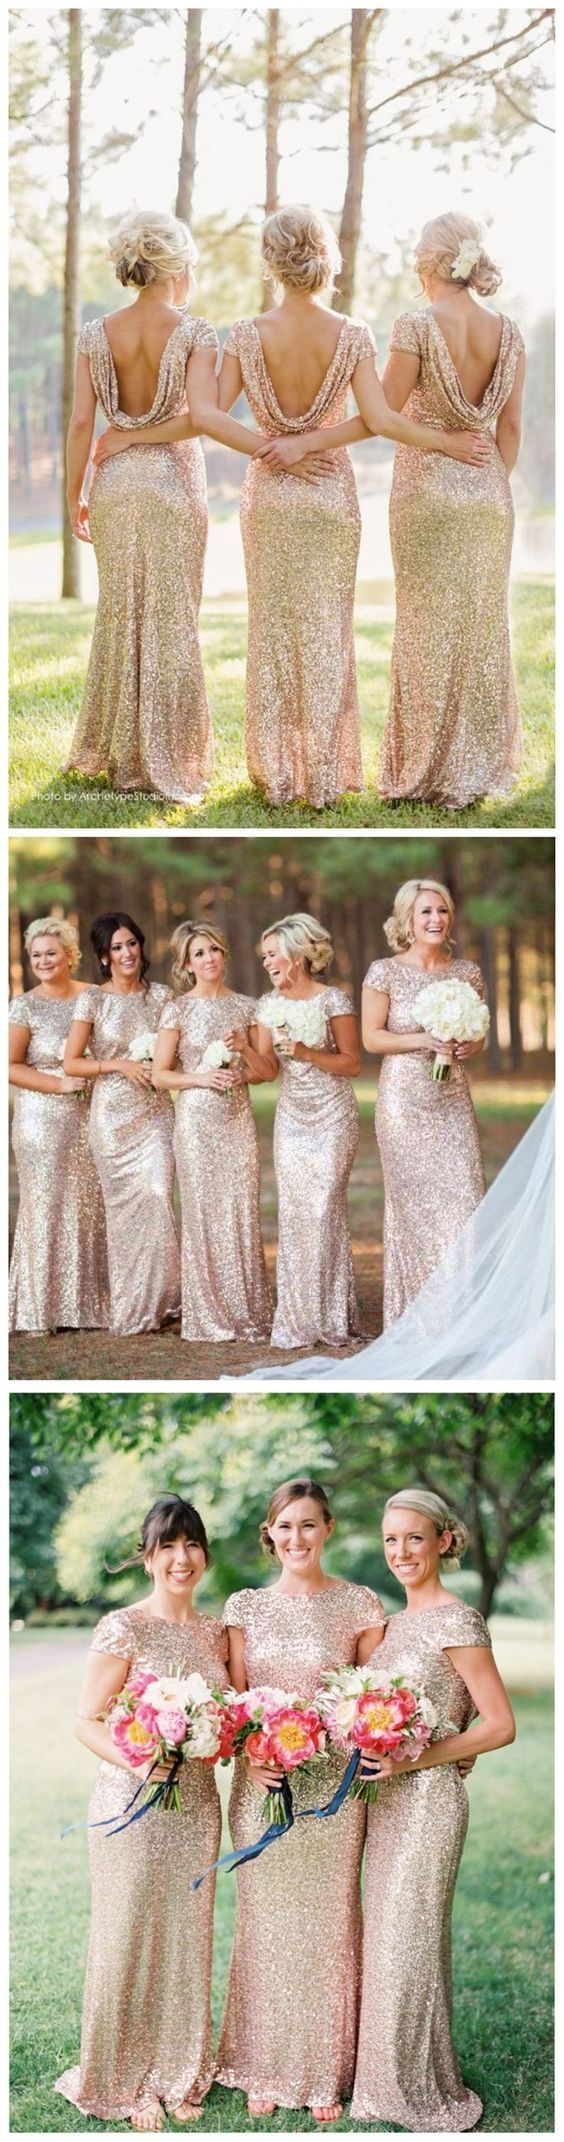 Sequin bridesmaid dress short sleeve bridesmaid dresses gold sequin bridesmaid dress short sleeve bridesmaid dresses gold bridesmaid dresses long bridesmaid dresses ombrellifo Image collections